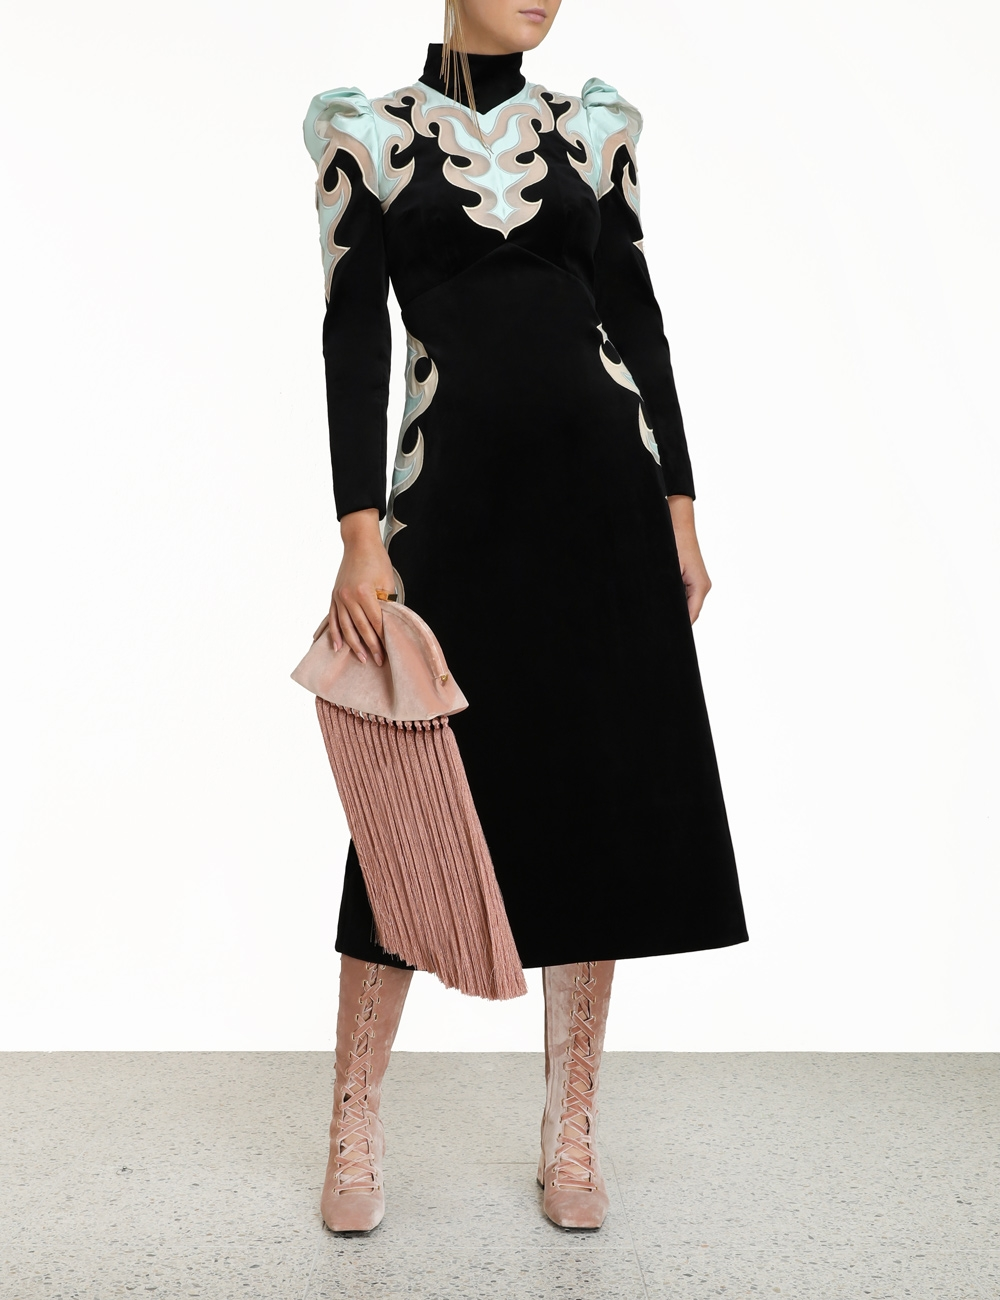 Ladybeetle Mystic Dress